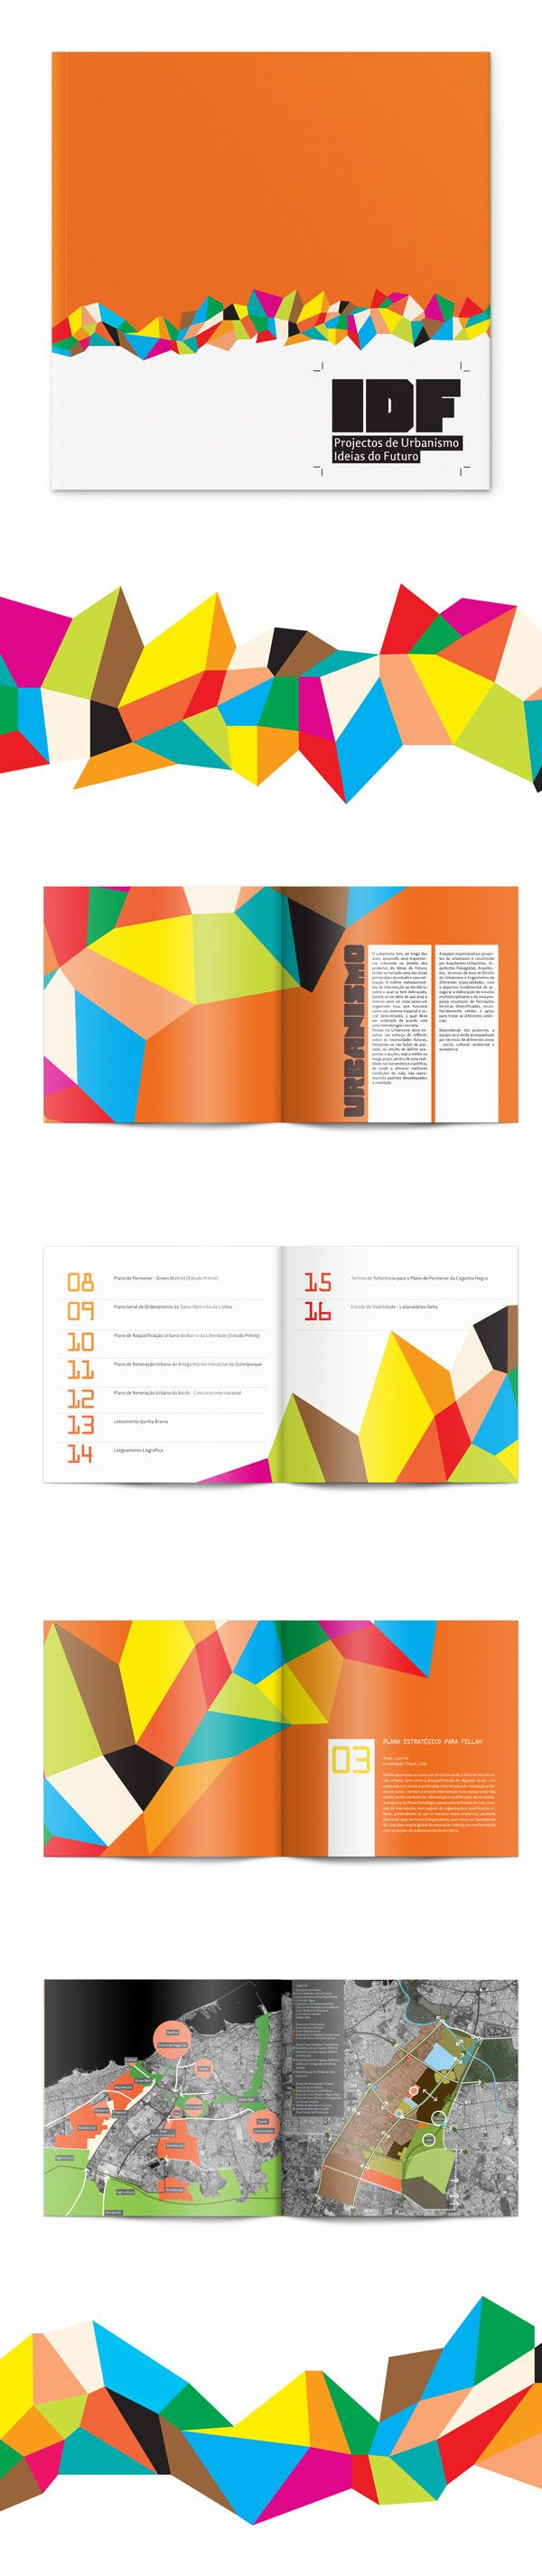 http://www.andysowards.com/blog/2012/40-fresh-examples-of-creative-crazy-print-brochure-design-inspiration/